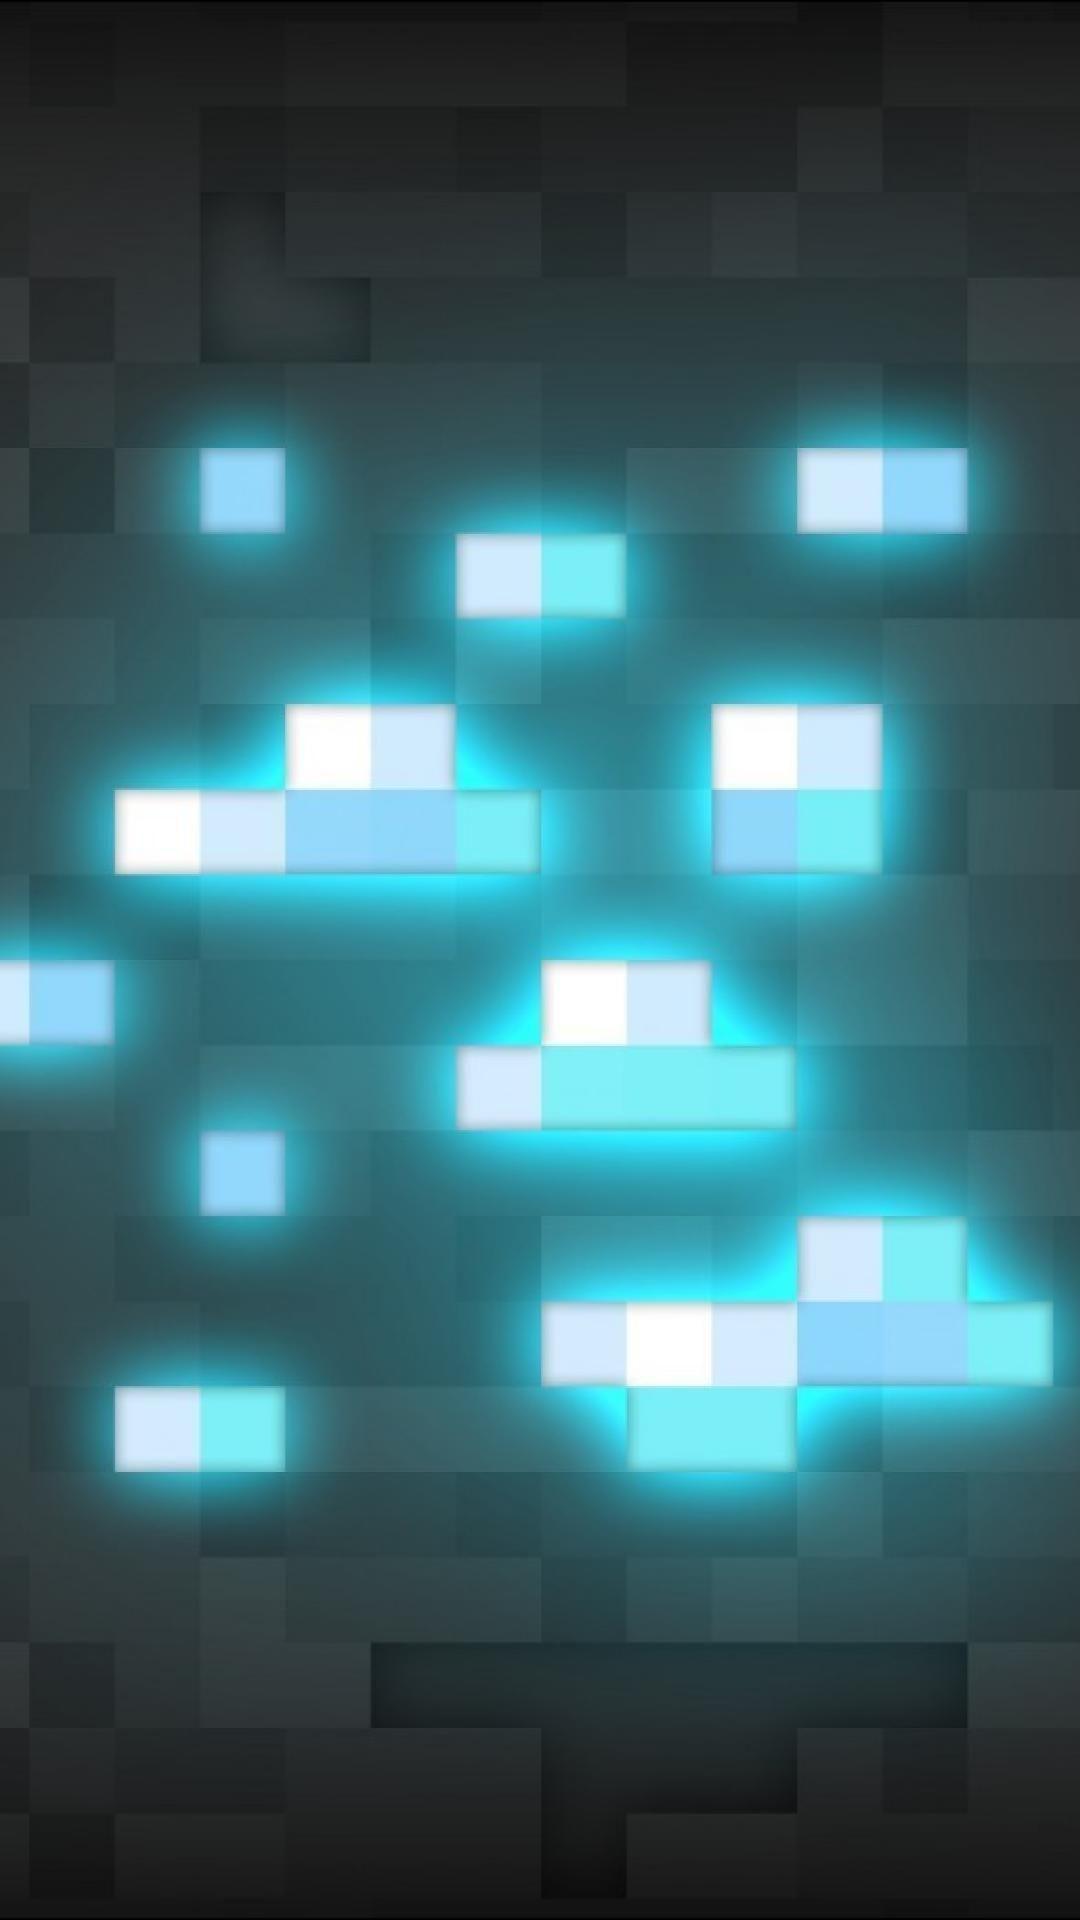 Creeper Minecraft Image In 2020 Minecraft Wallpaper Minecraft Images Creeper Minecraft